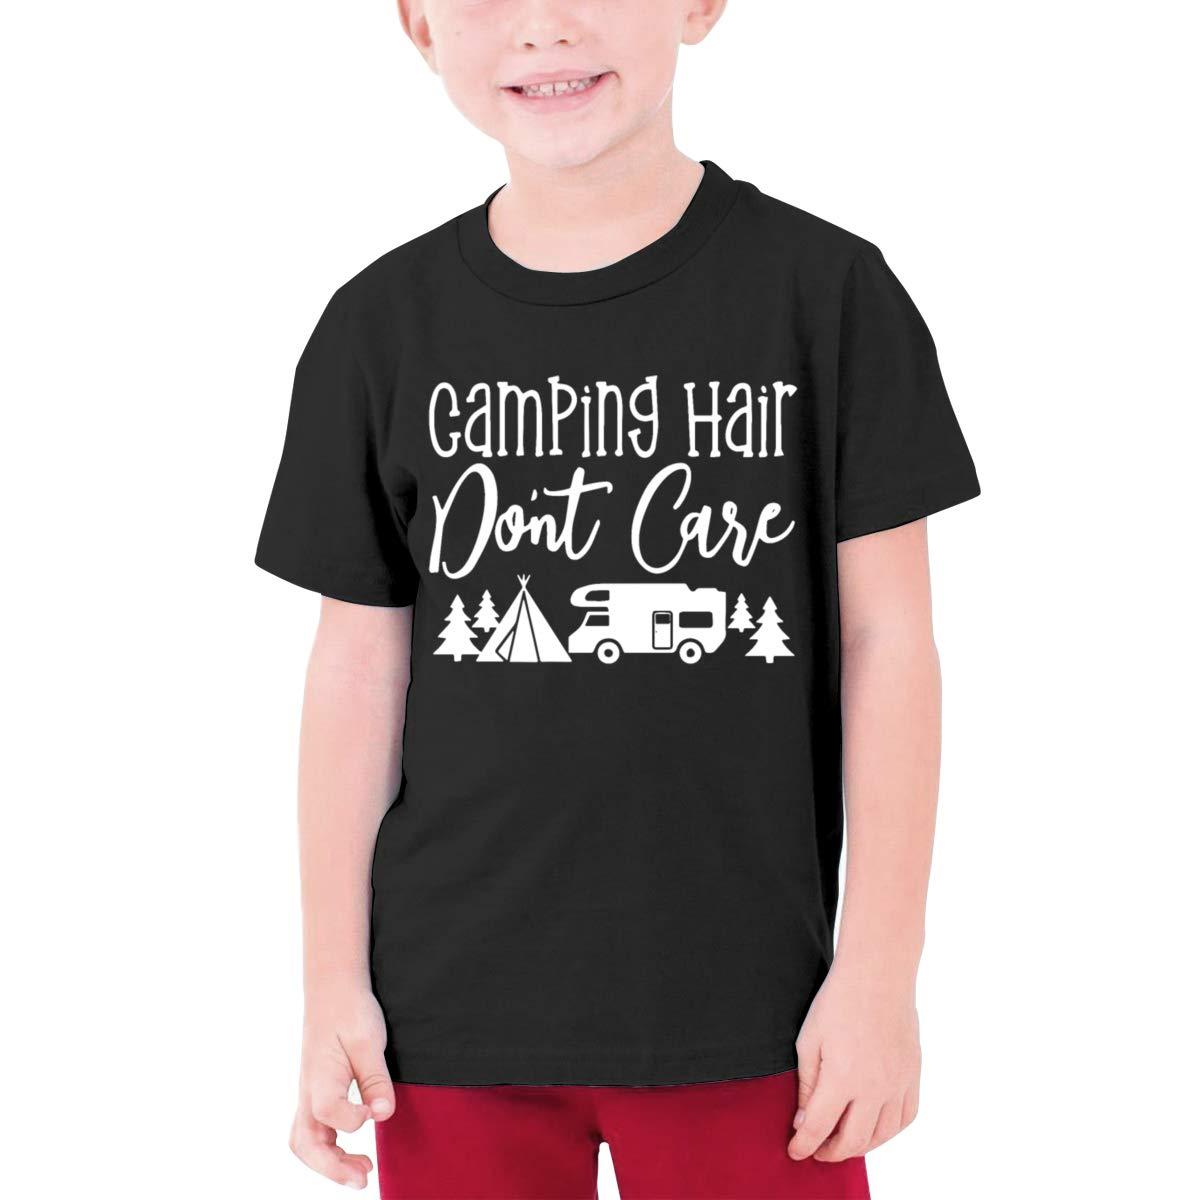 Fzjy Wnx Camping Hair Dont Care Boy Short-Sleeved Shirt